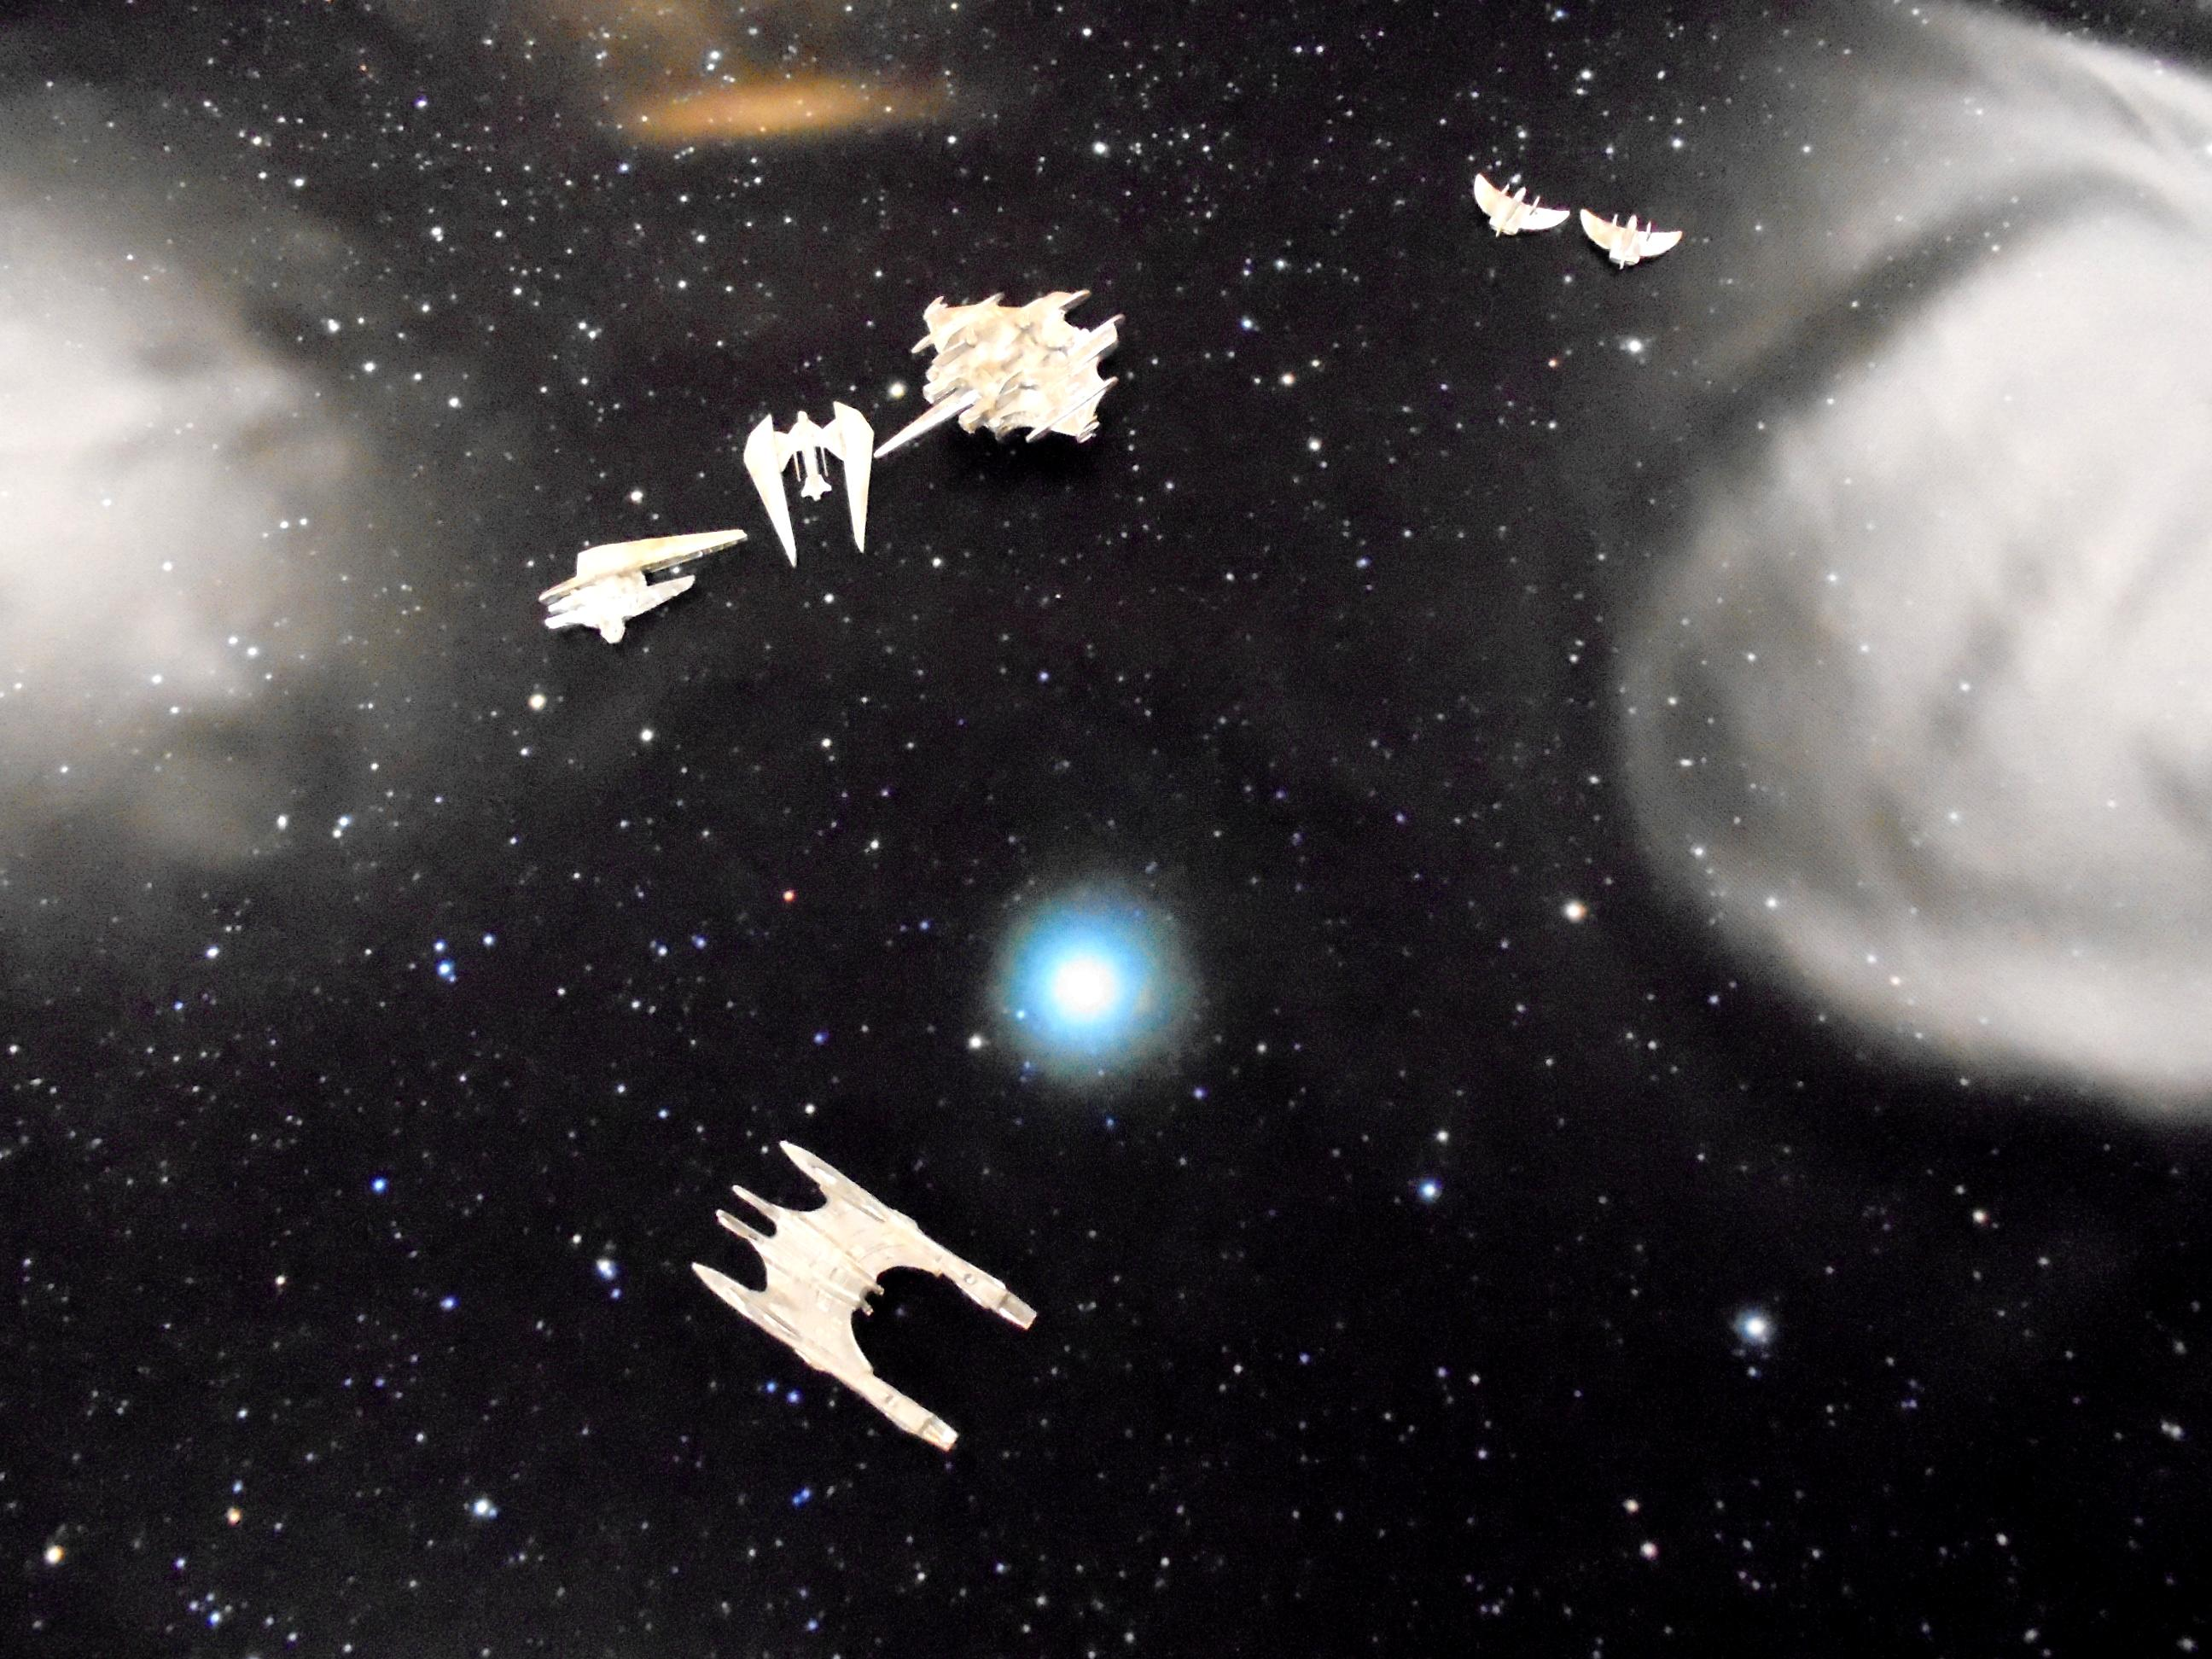 Acta., Babylon 5, game 2, turn 4 end